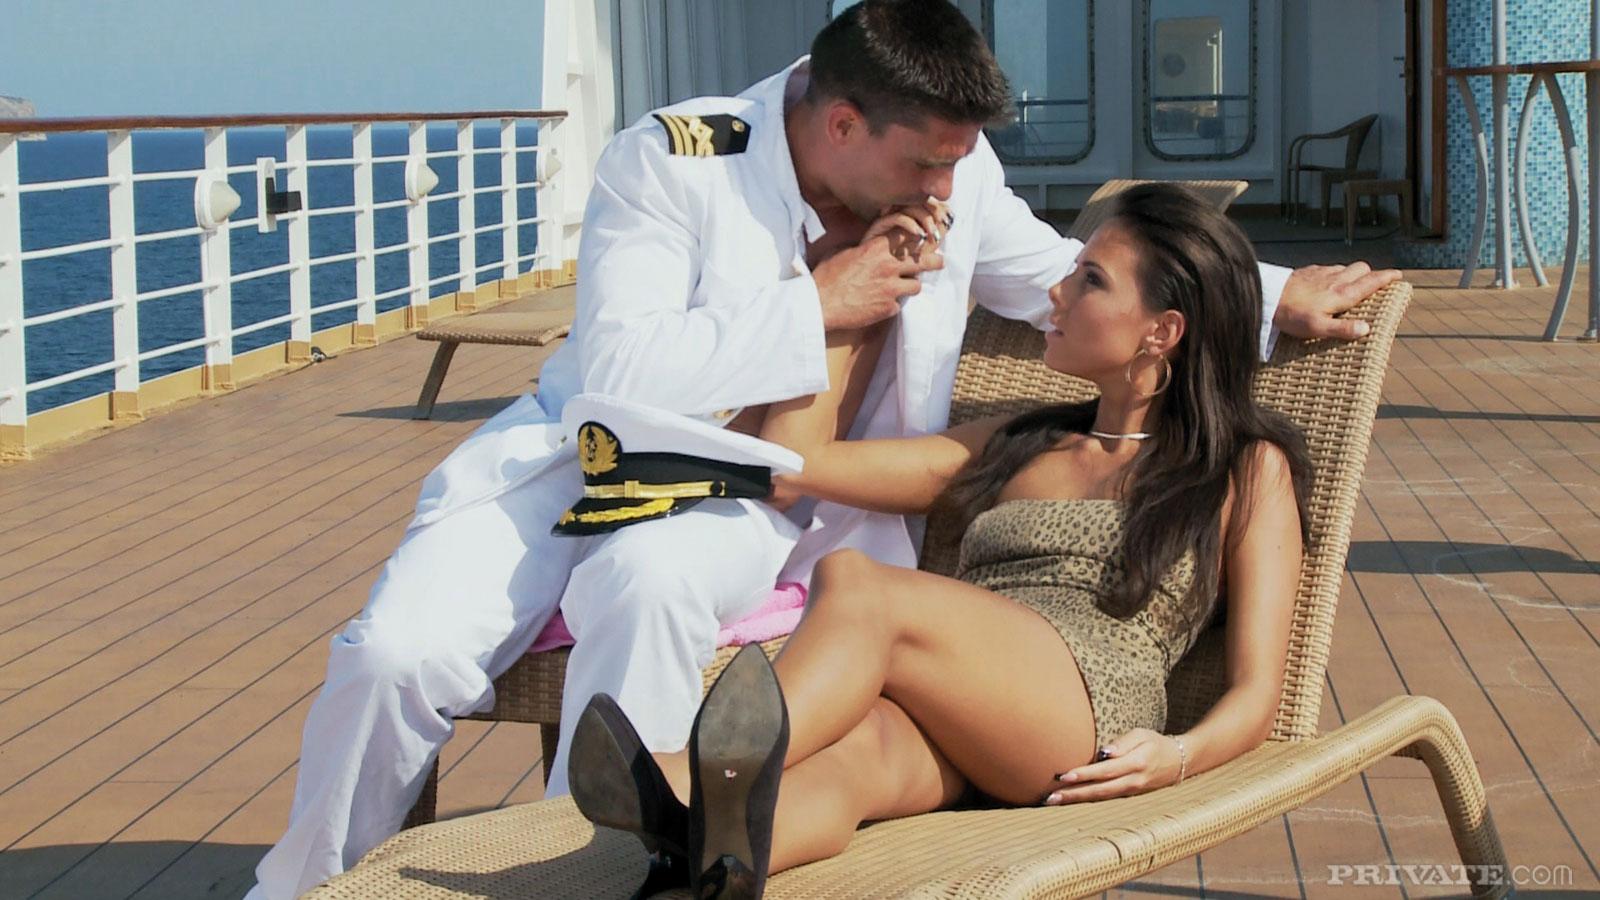 Not melanie memphis lust boat